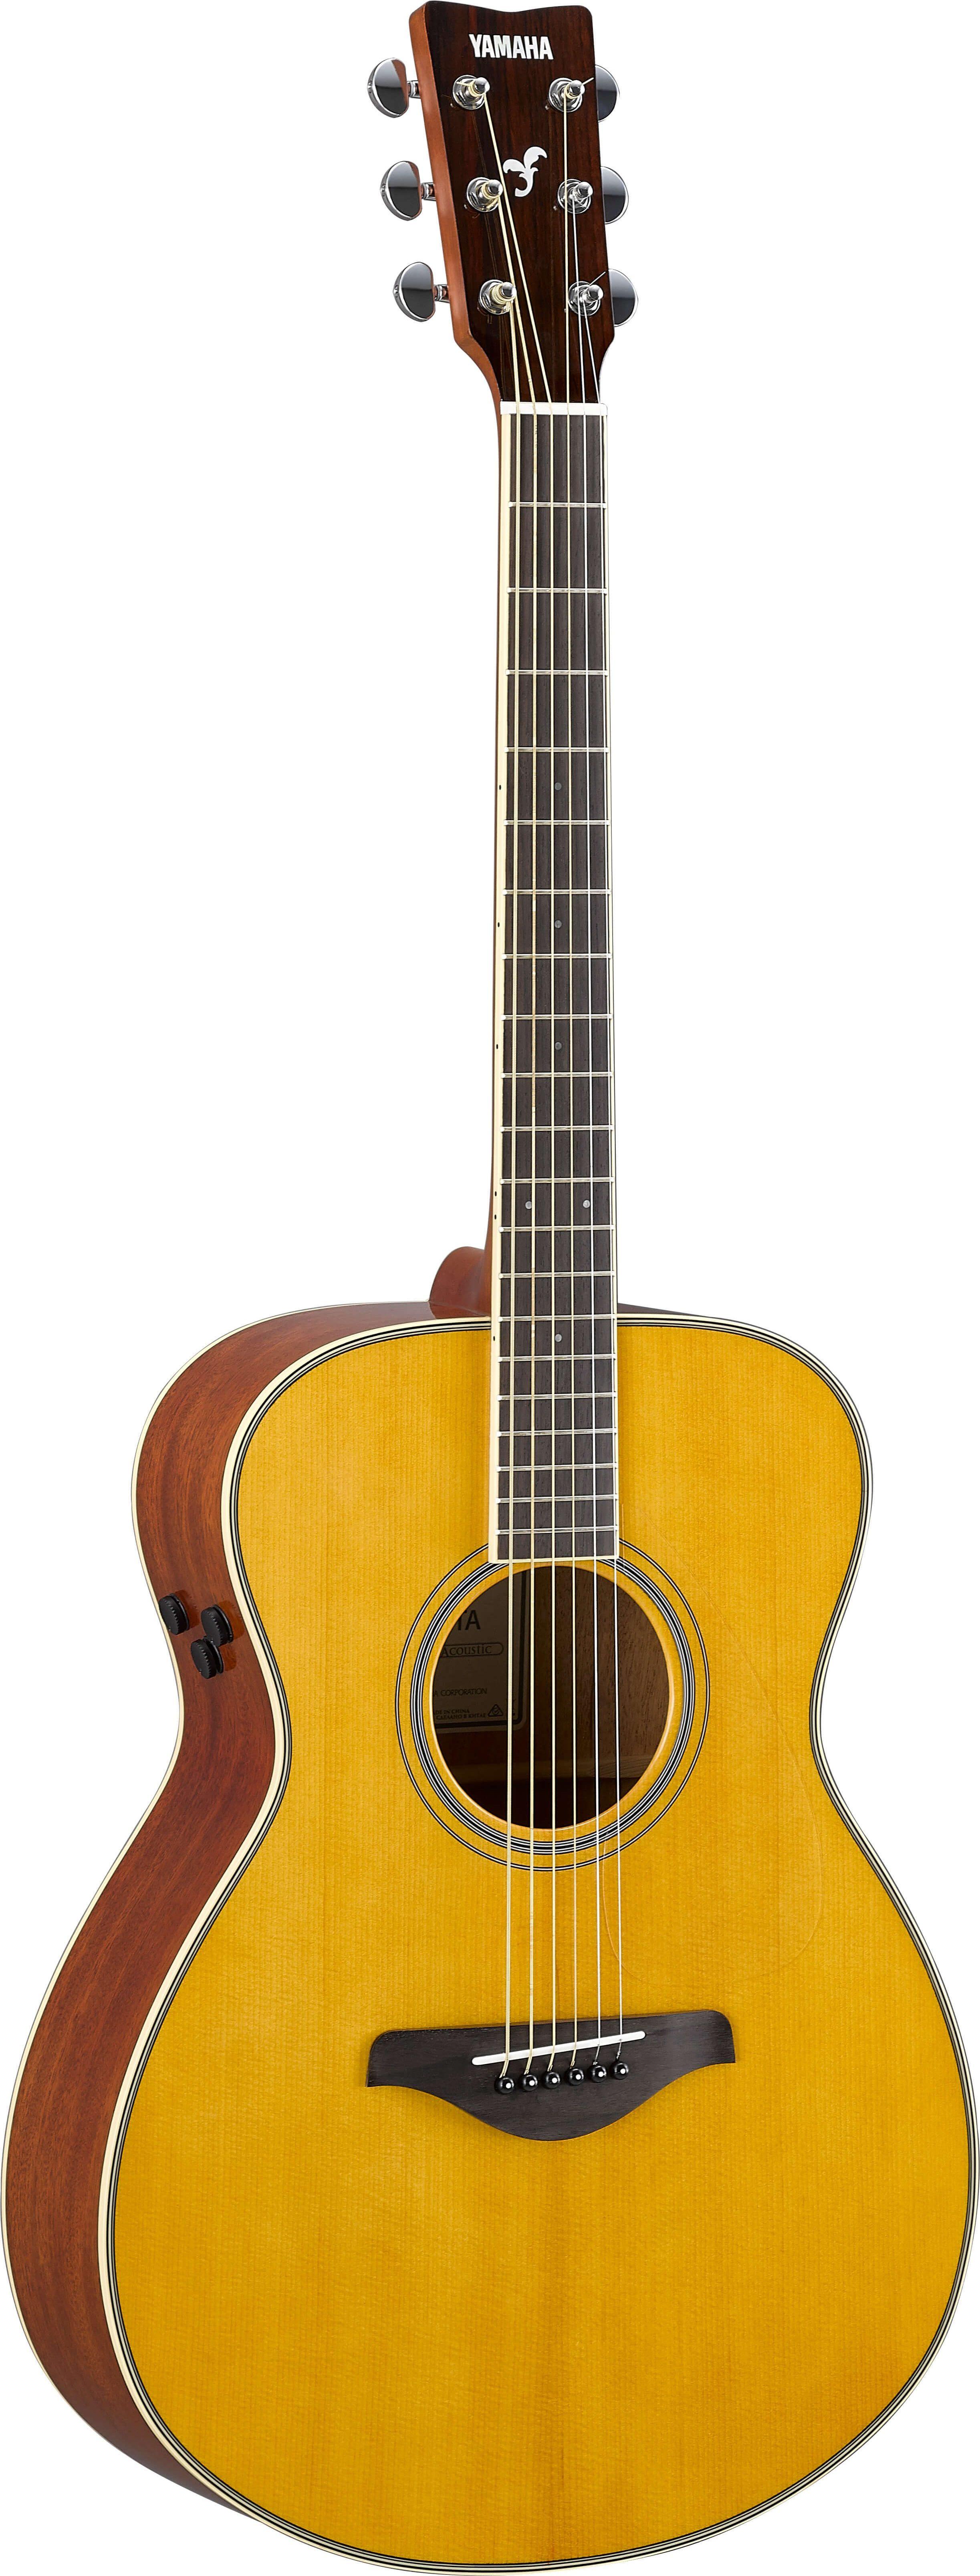 Namm 2018 yamaha announces affordable fg transacoustic for Yamaha fs 310 guitar